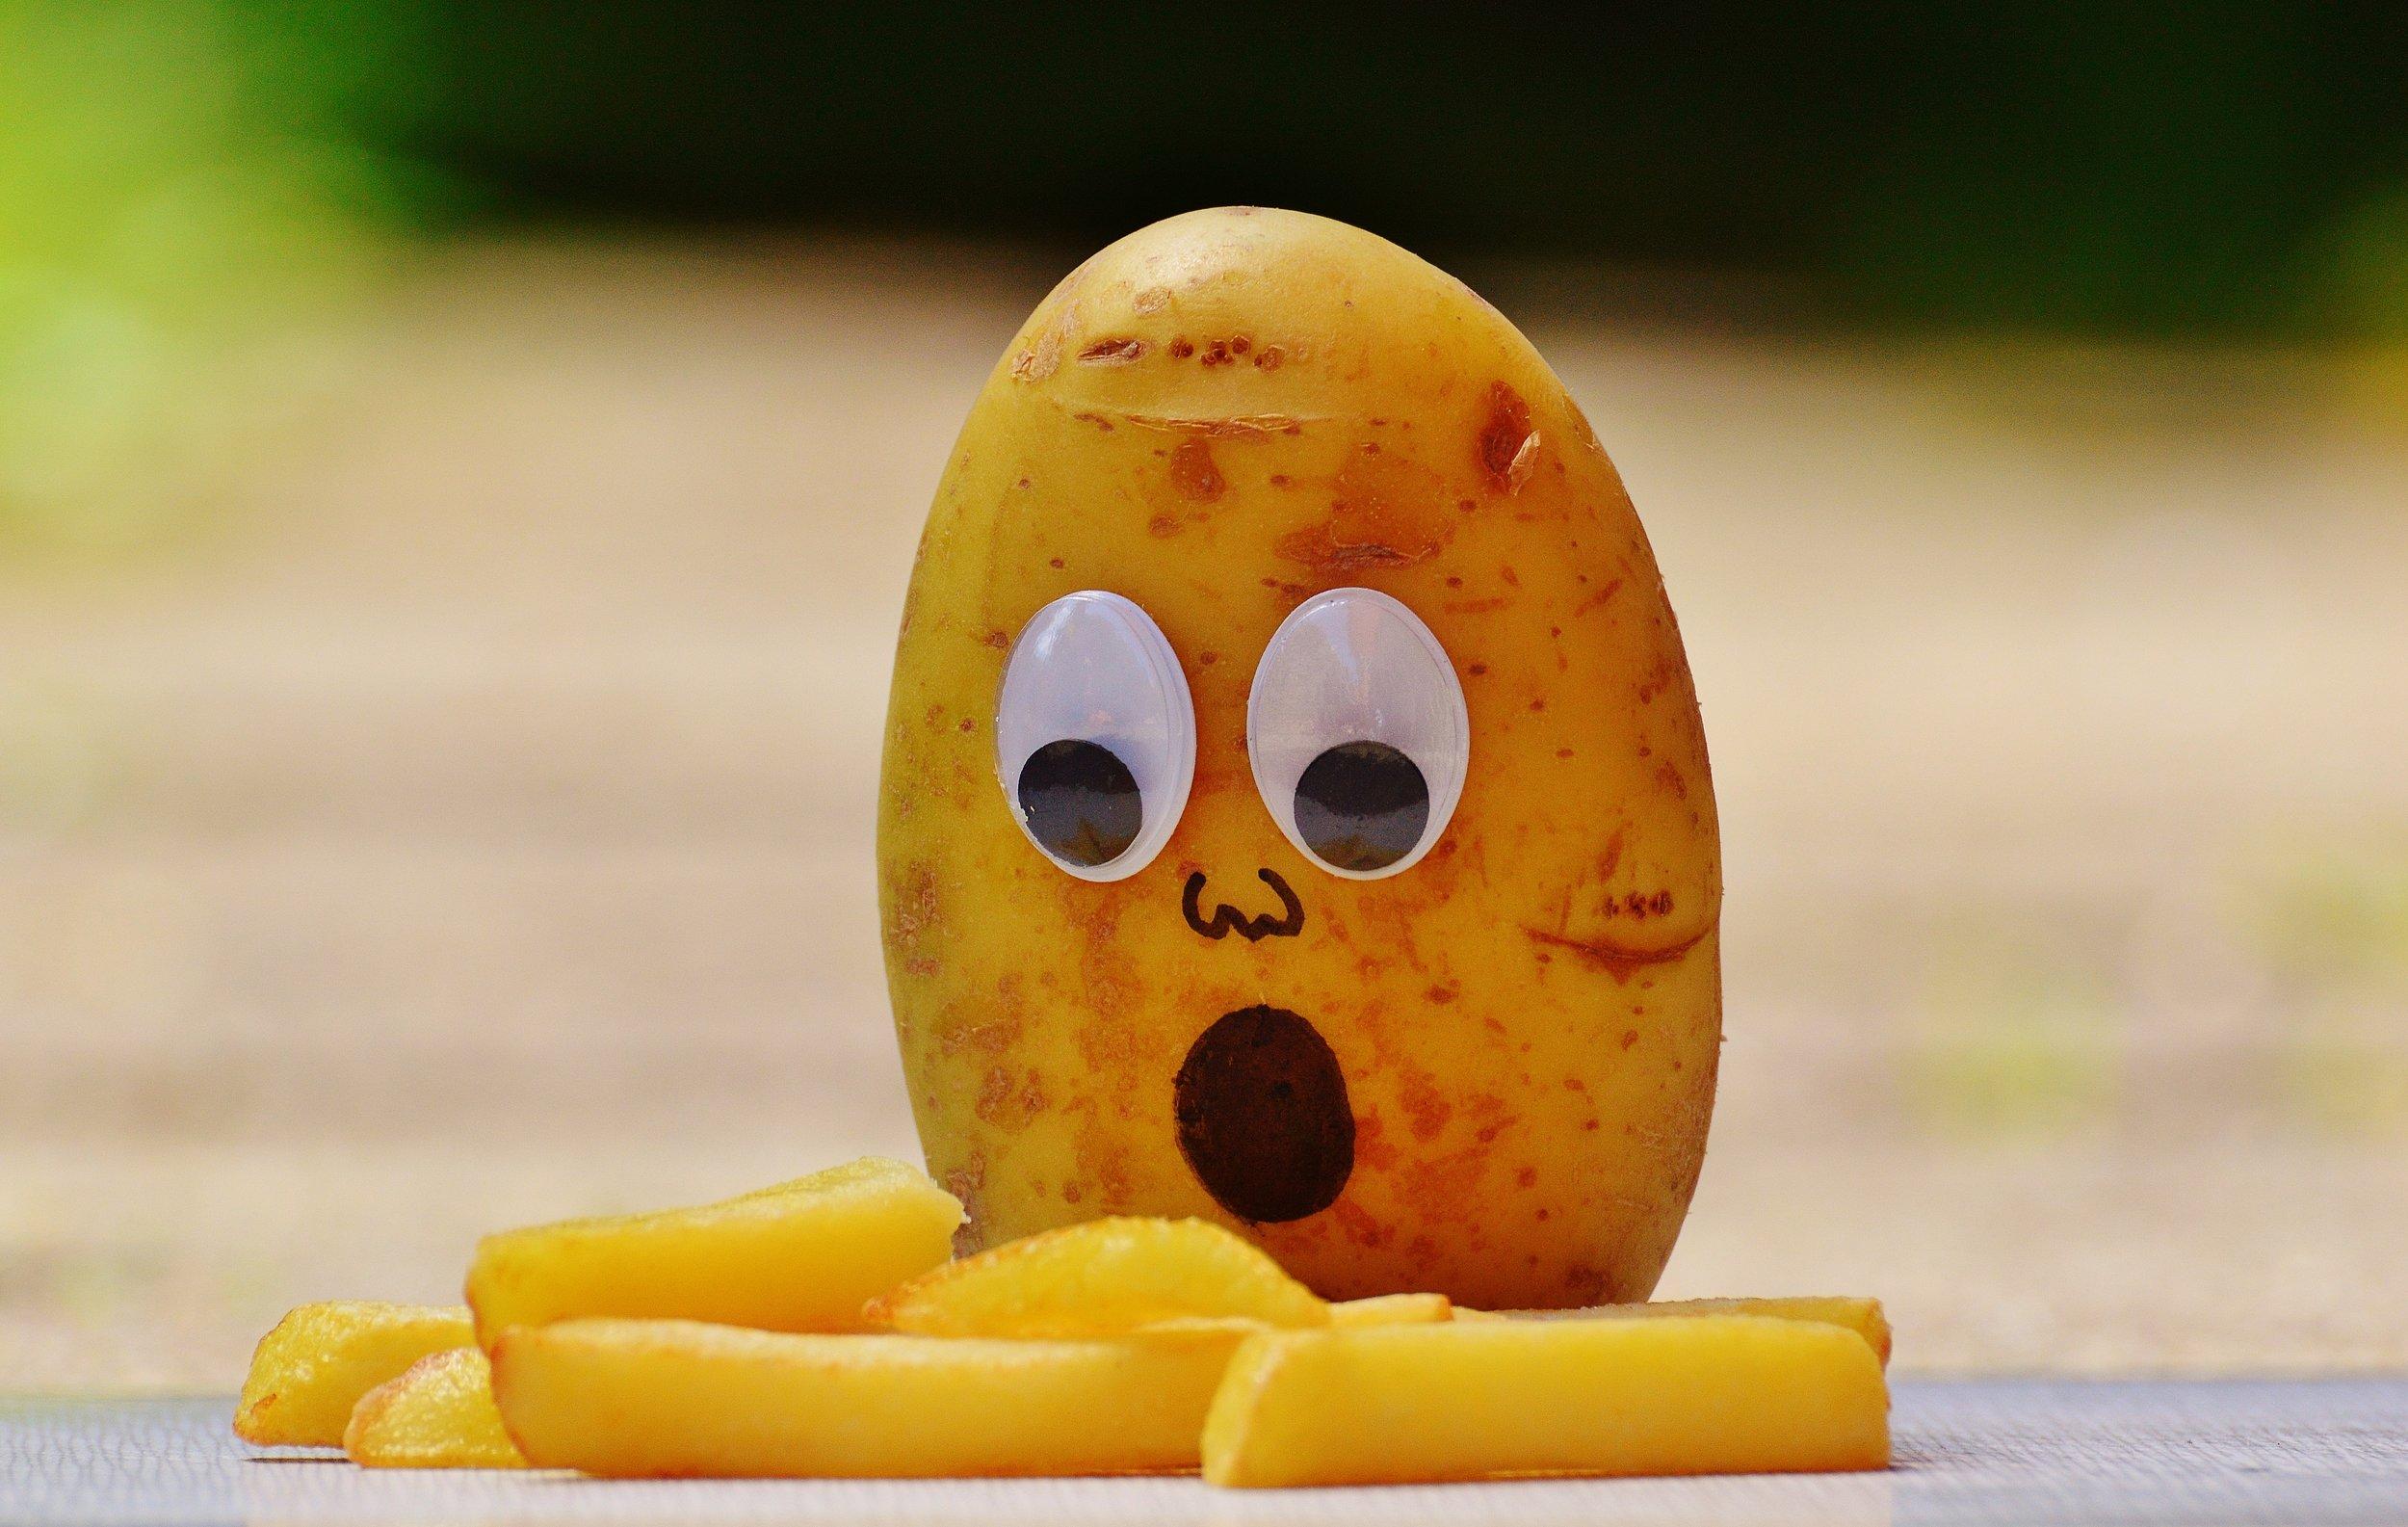 Potato - The Youth Academy